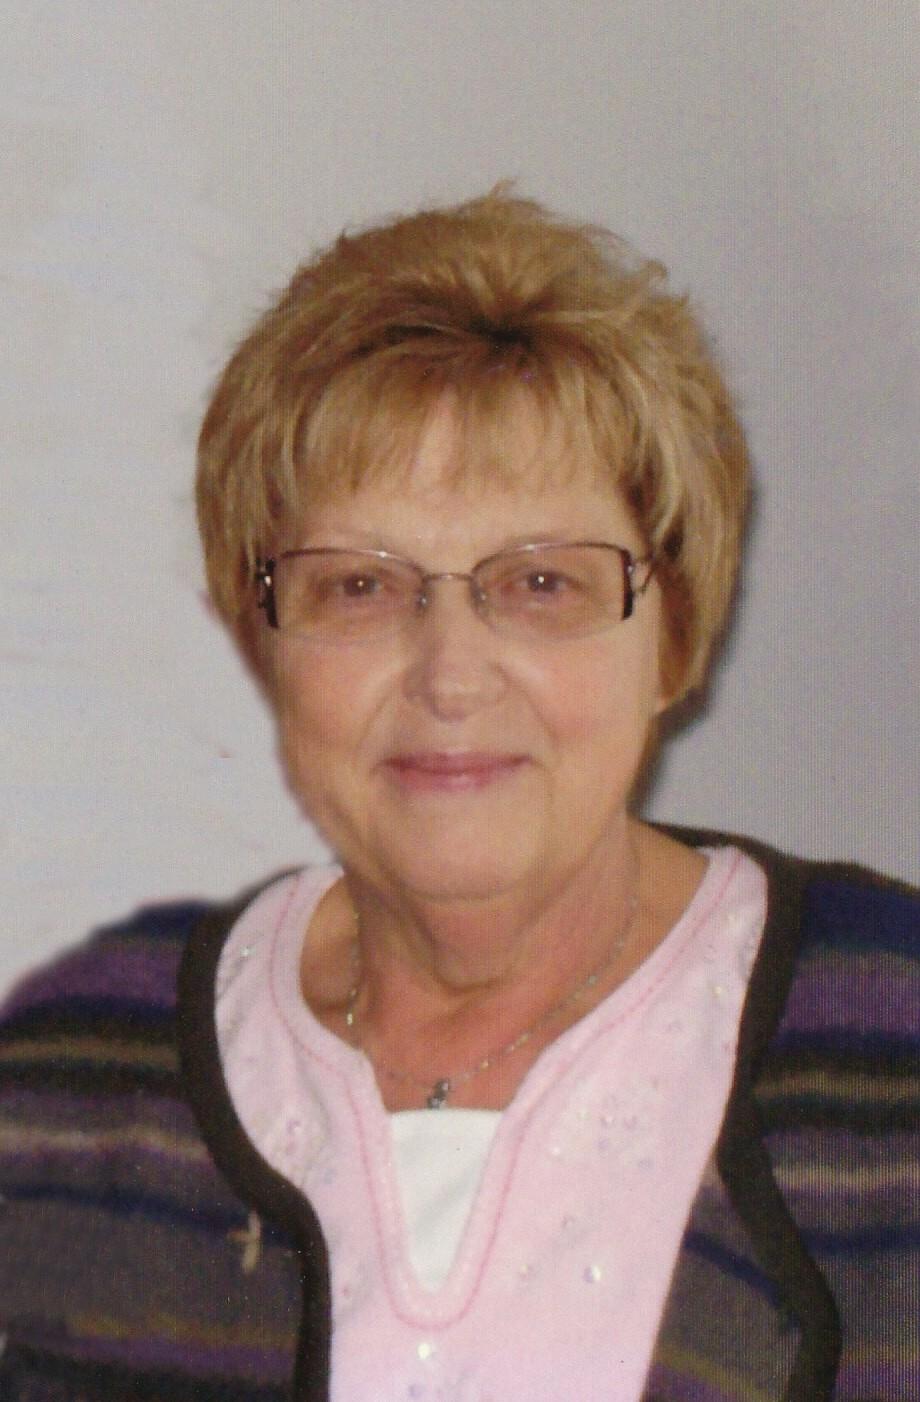 Maria (Mrs. Wayne) Emanuel, age 75, of Beemer, Nebraska